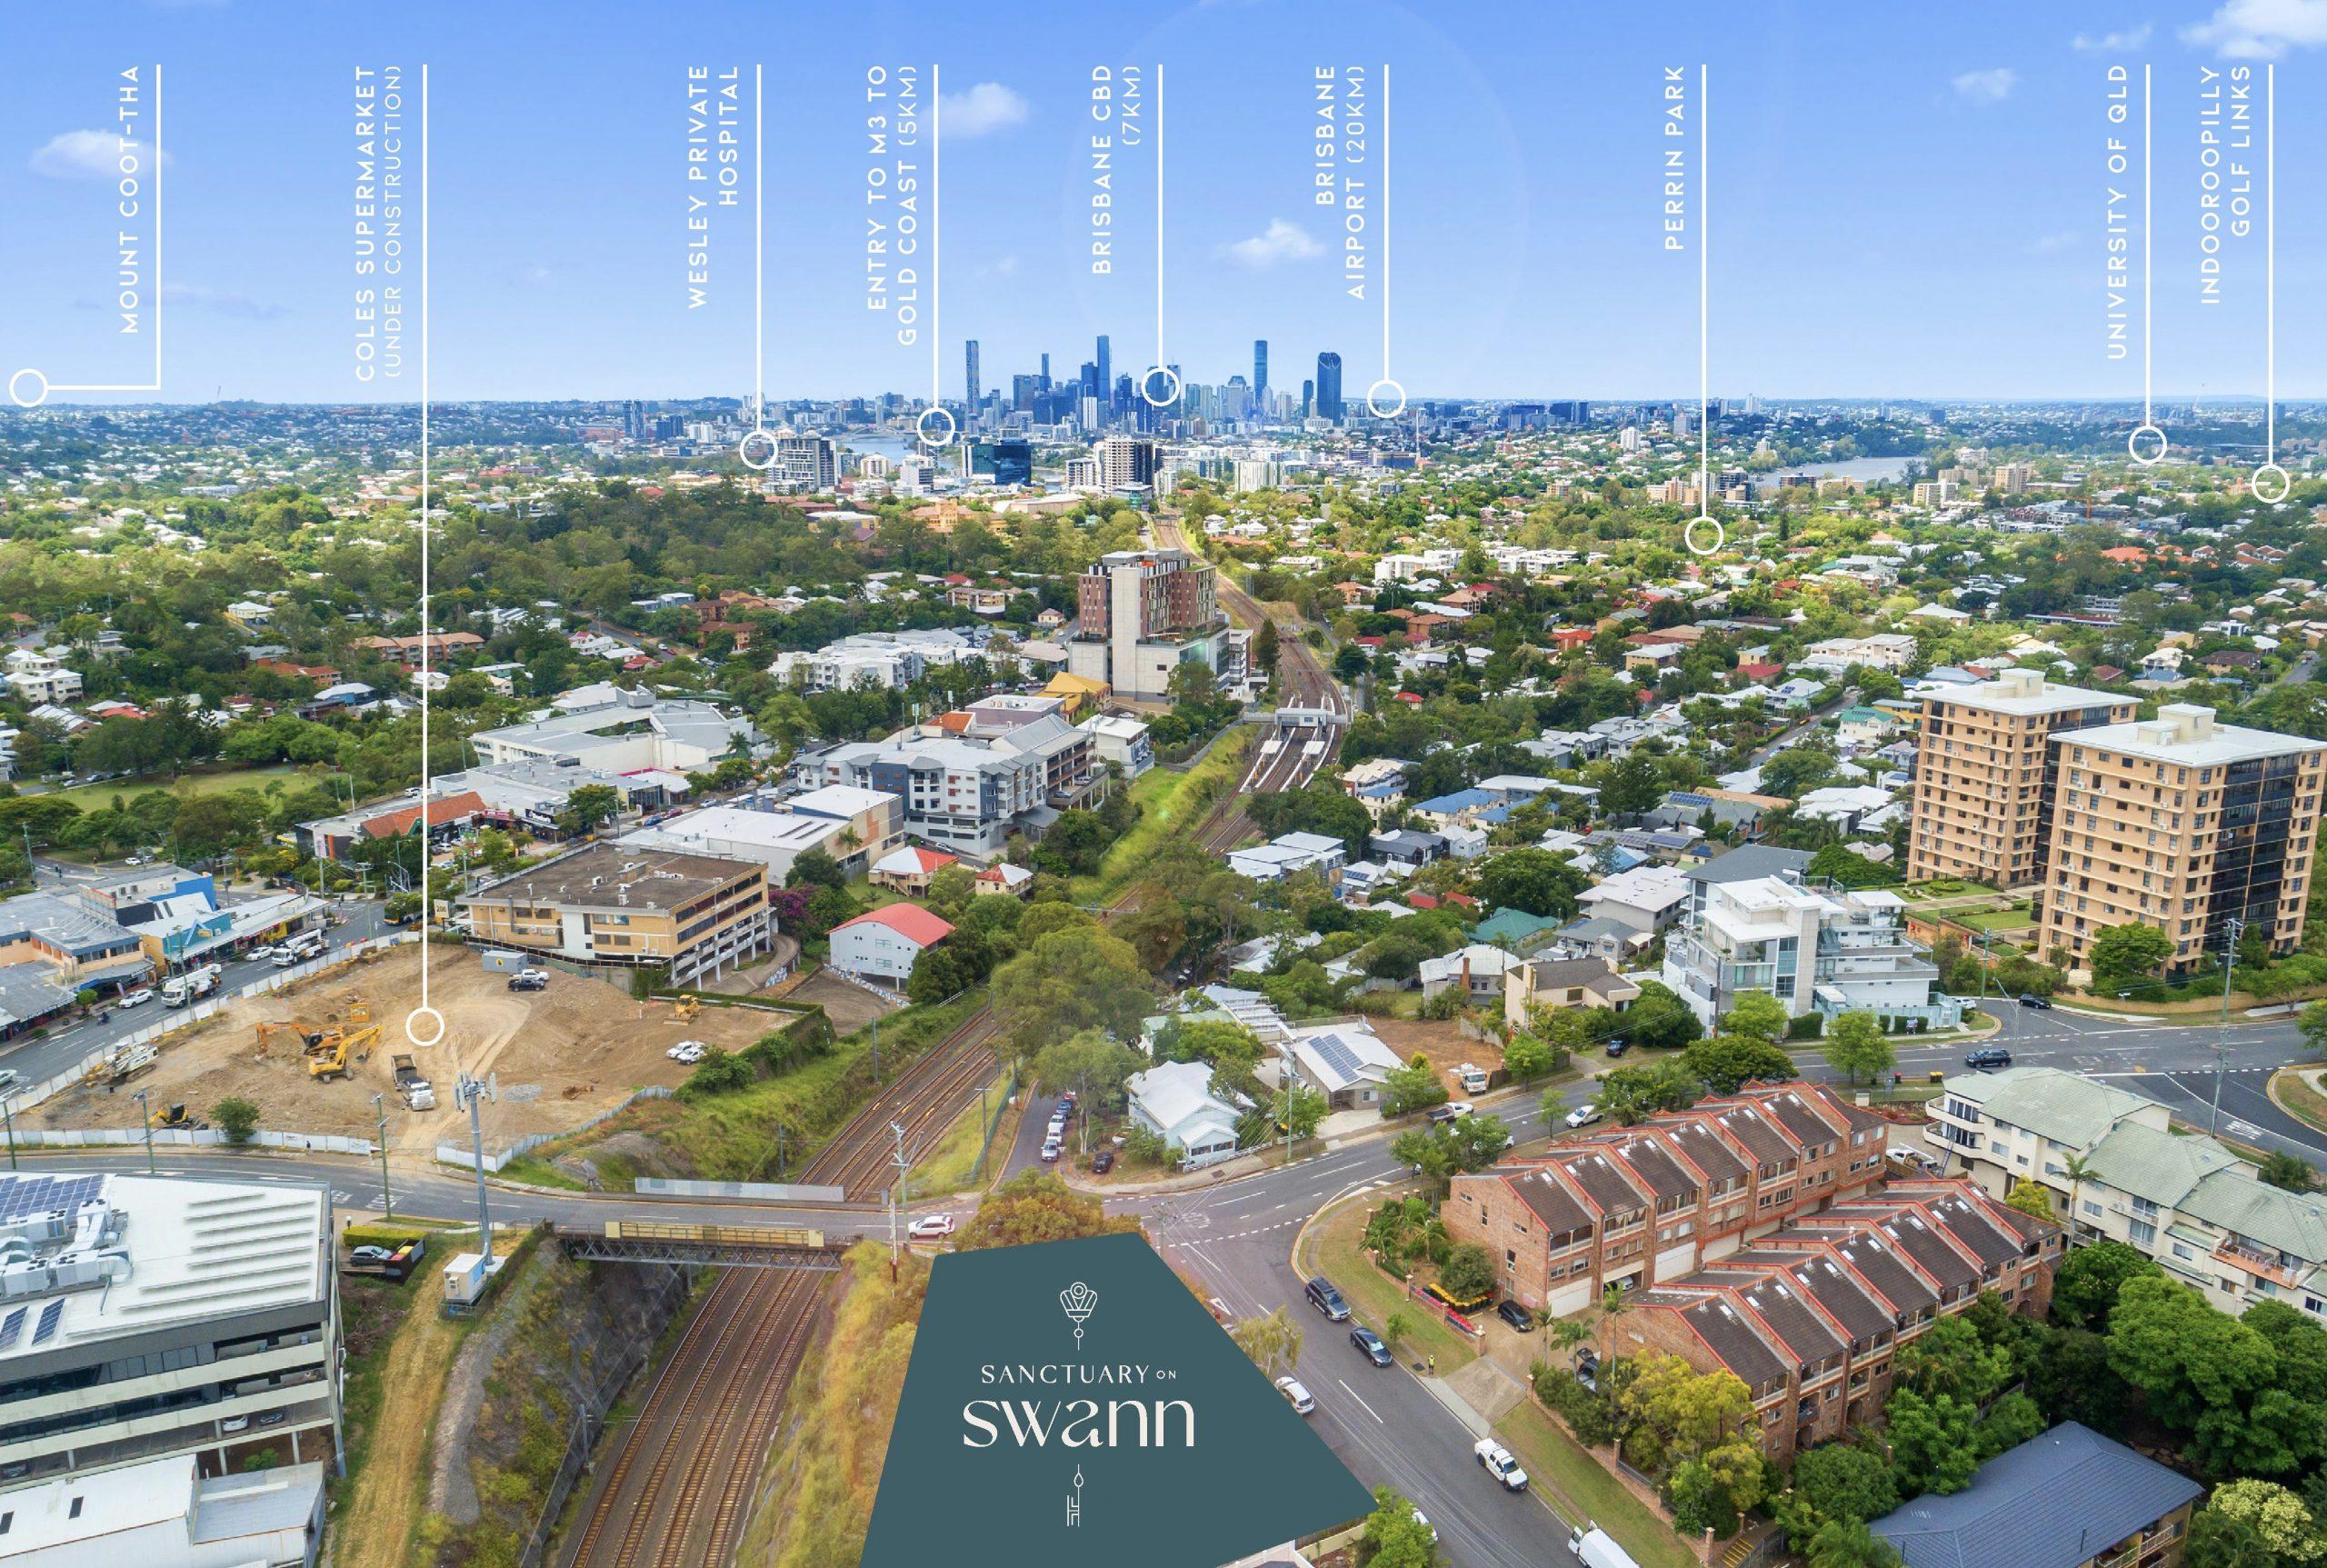 Swann Sanctuary Aerial Map